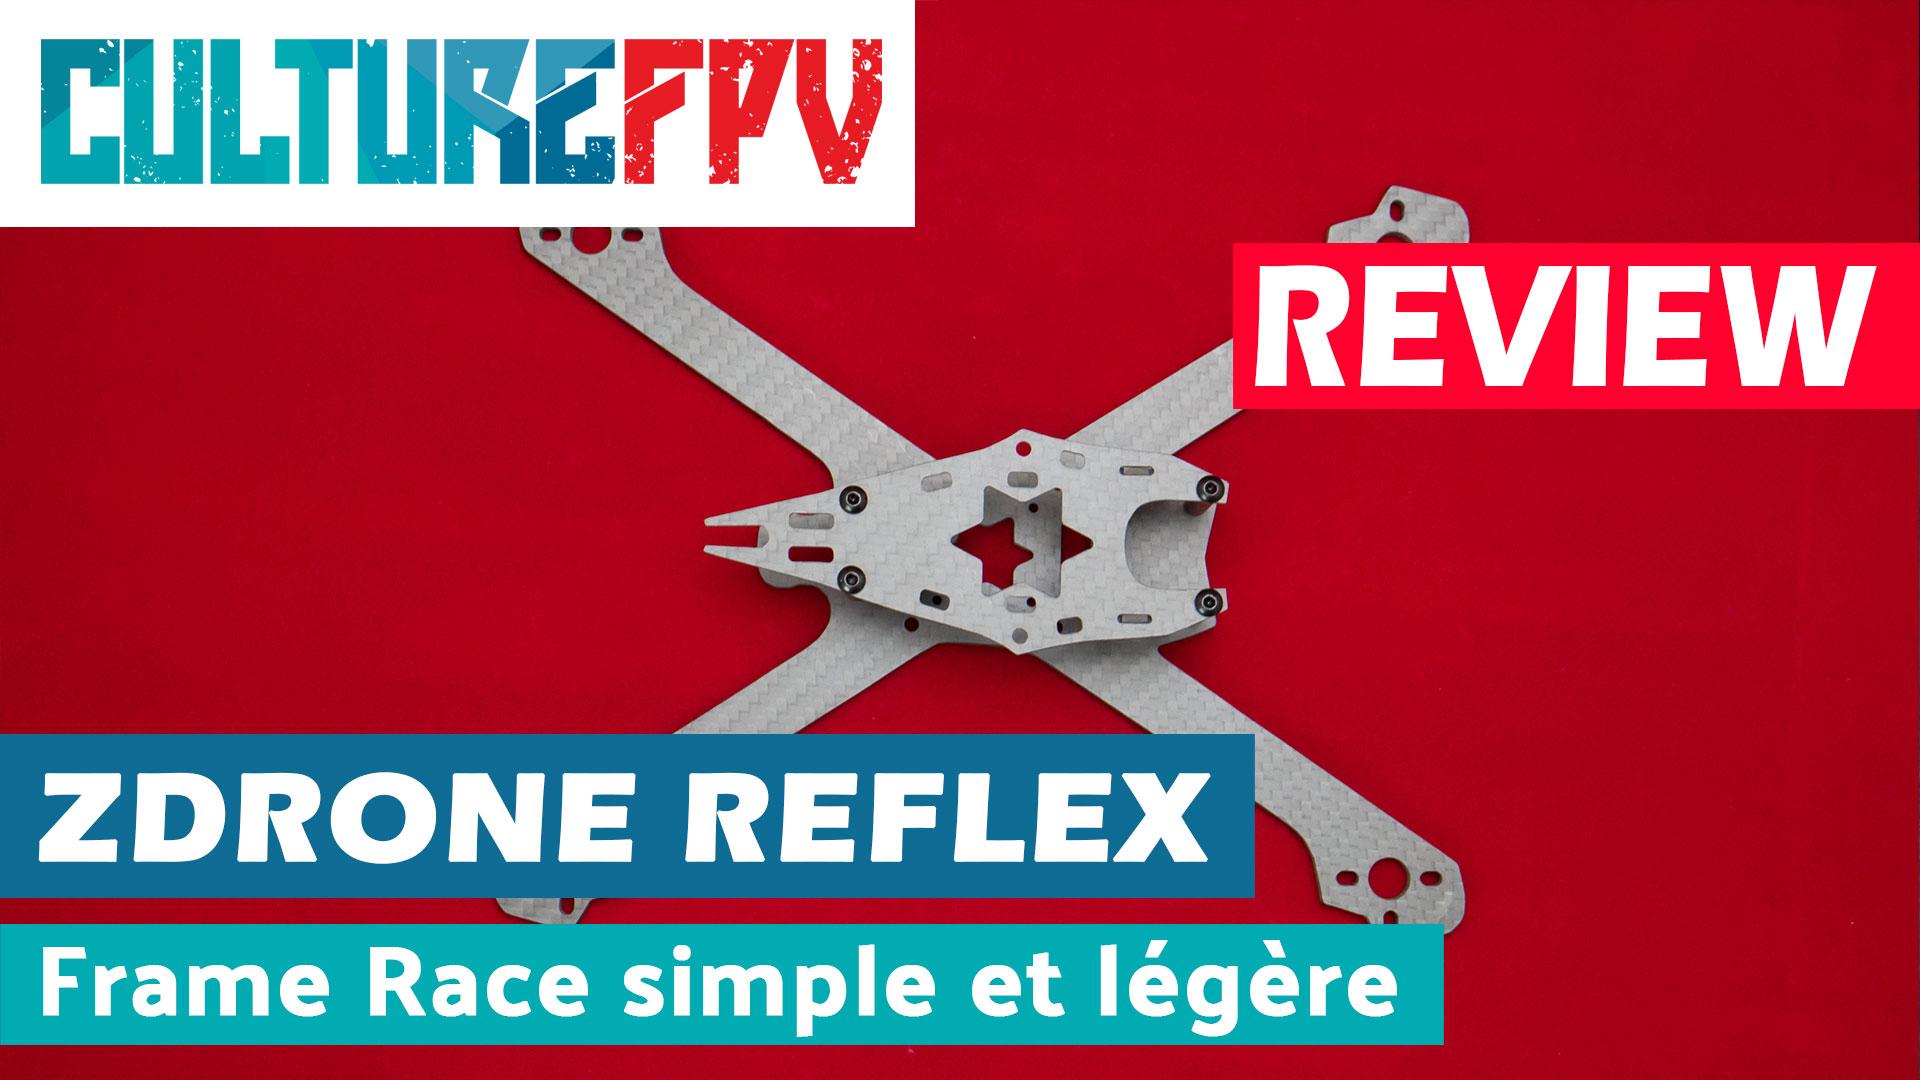 Zdrone Reflex